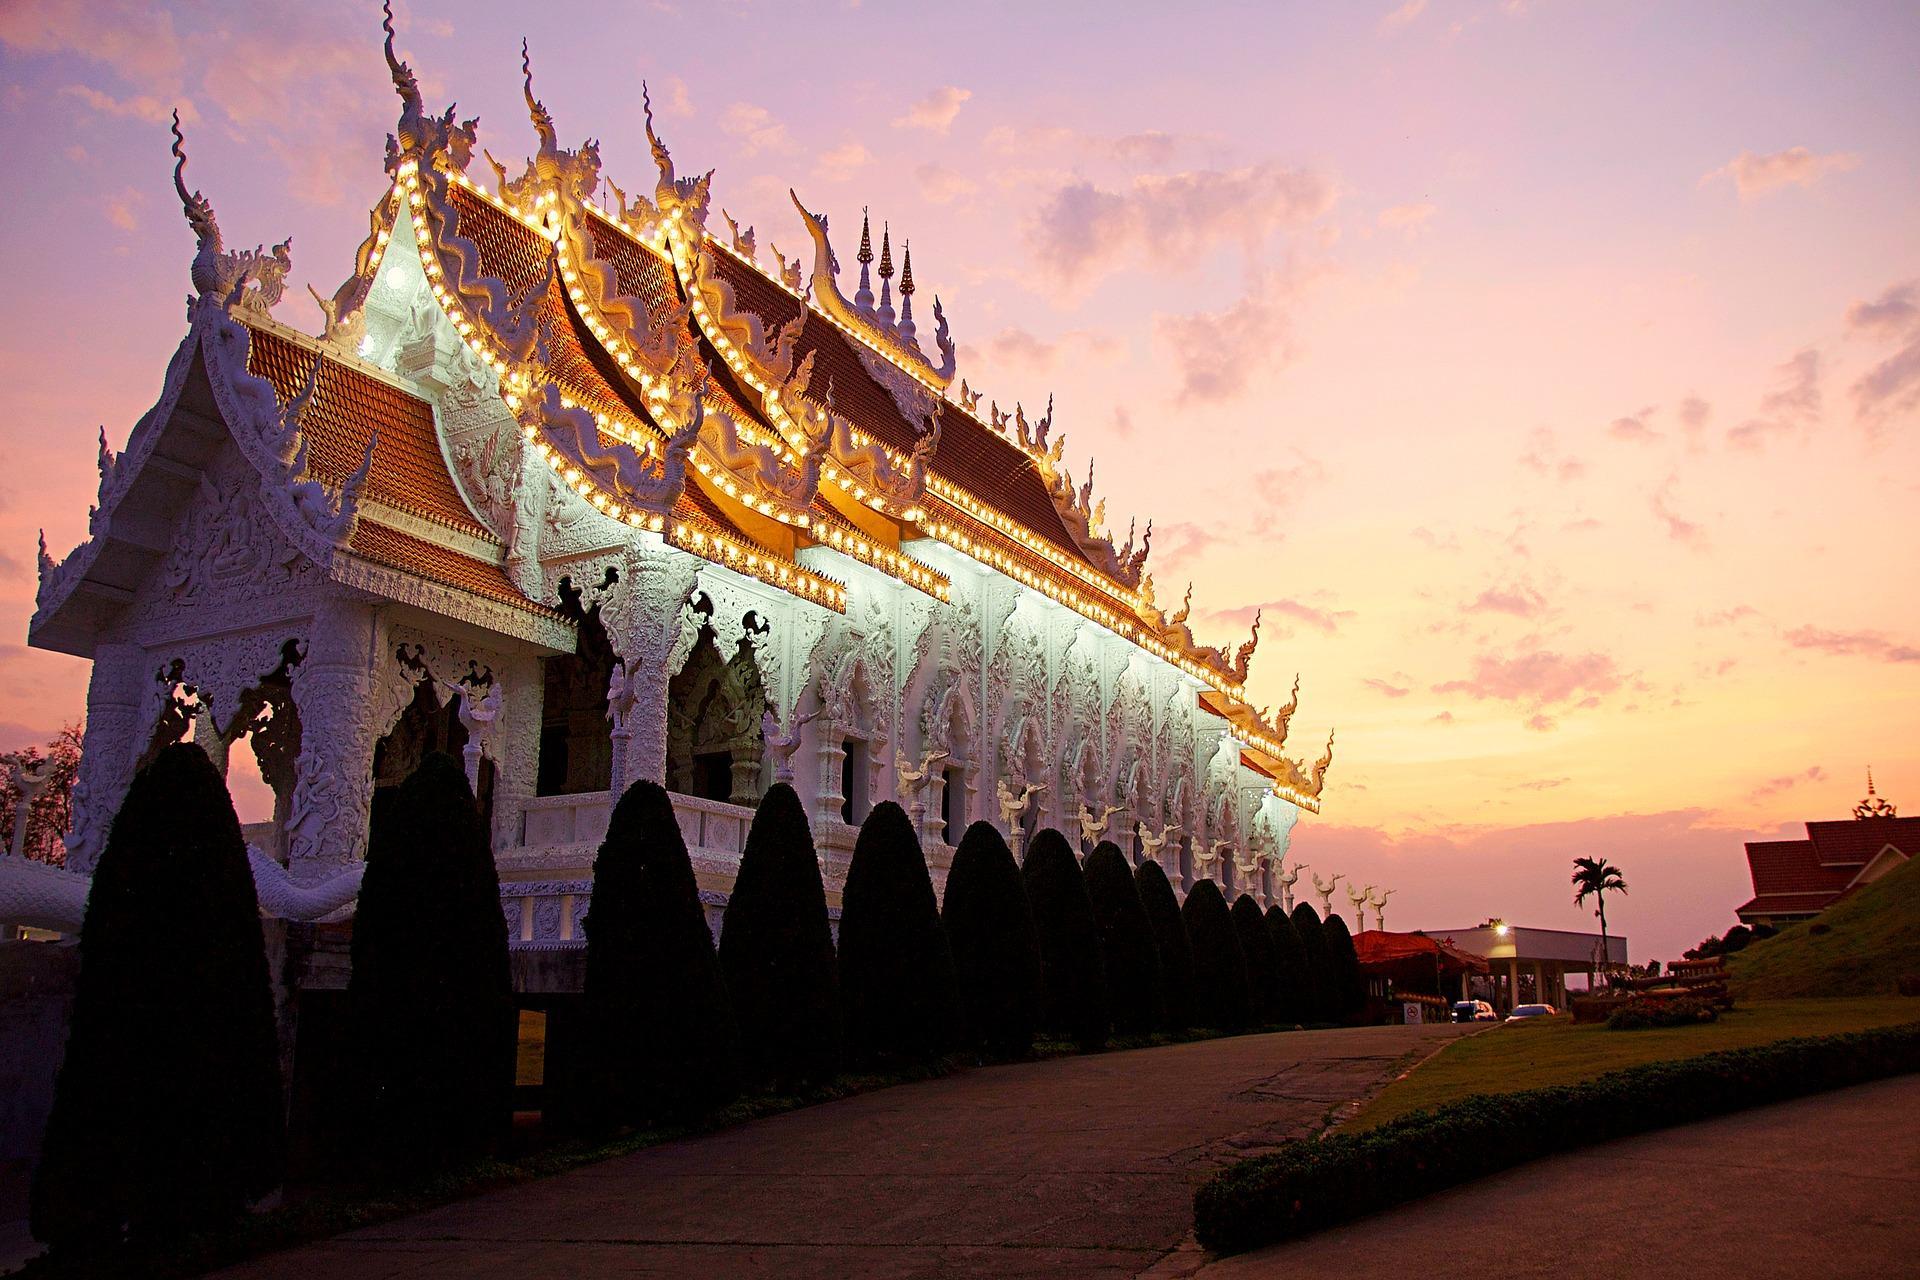 /optitravel/online/www/layout22/single_product.php?pkt_id=148&Produto=Bangkok, Maravilhas do Norte (Privado) & Koh Samui&destino=TAILÂNDIA